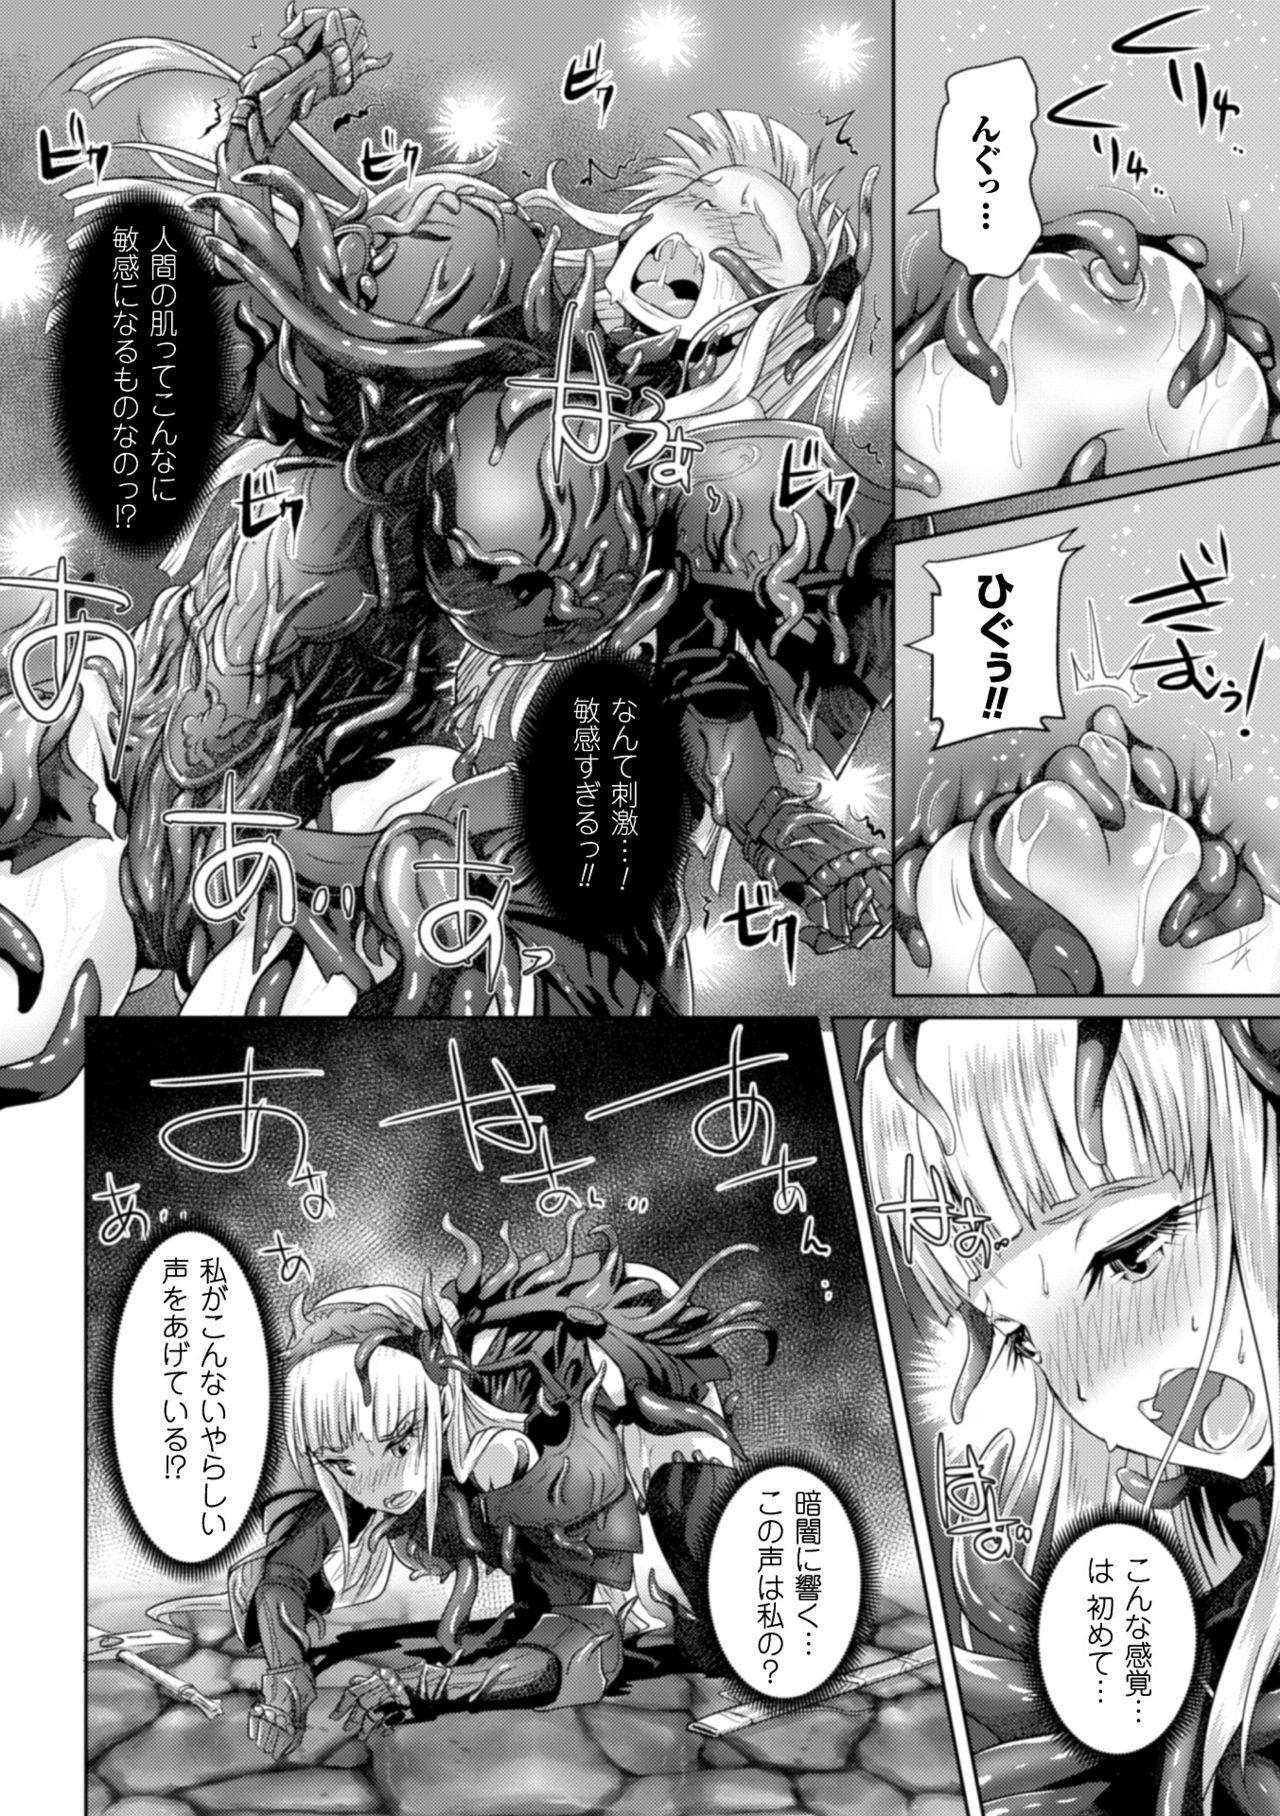 2D Comic Magazine Shokushu Yoroi ni Zenshin o Okasare Mugen Zecchou! Vol. 5 11